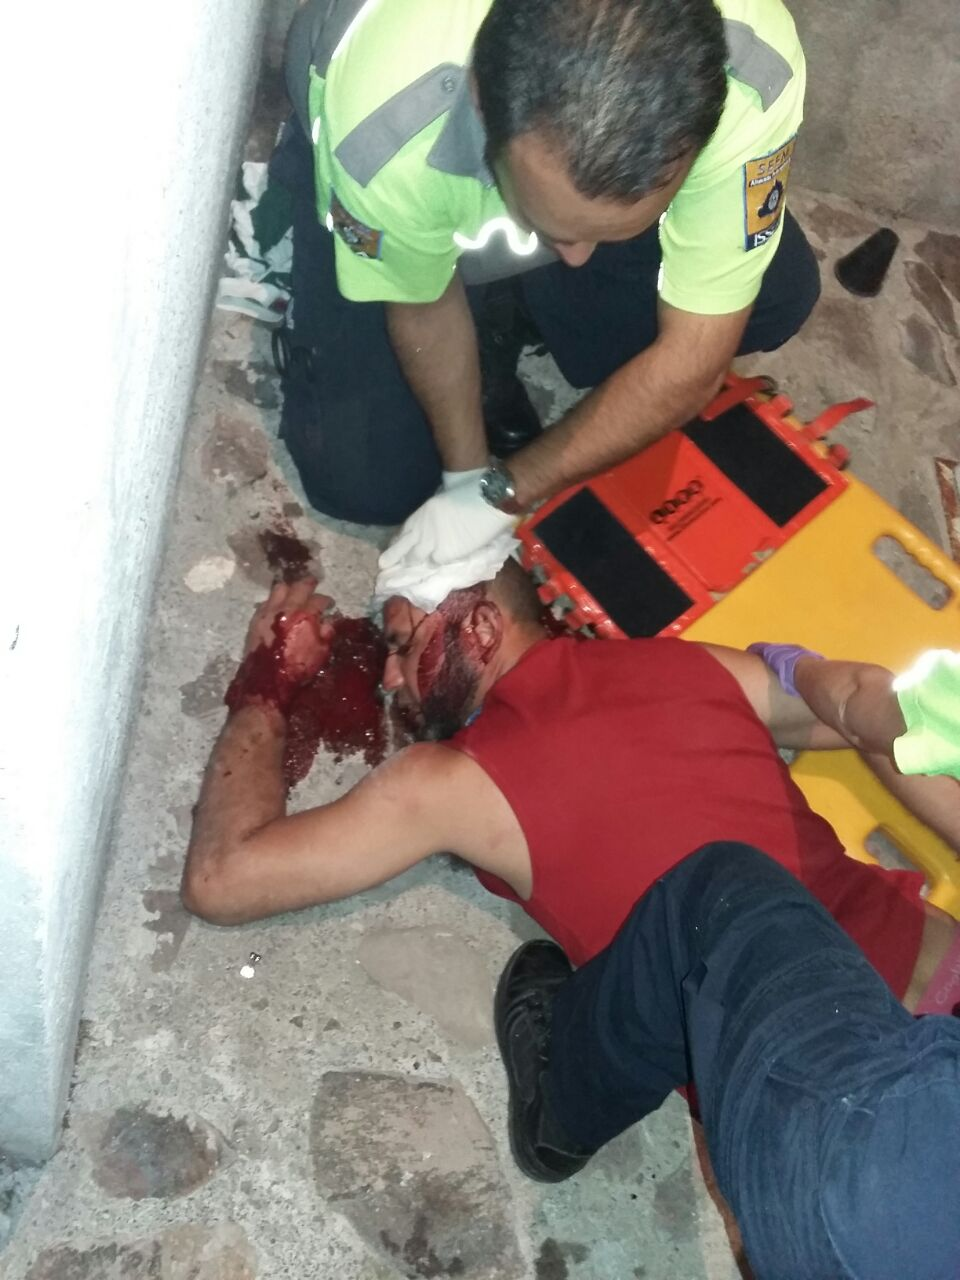 ¡Grave joven que cayó de la azotea de una casa en Aguascalientes y se golpeó la cabeza!